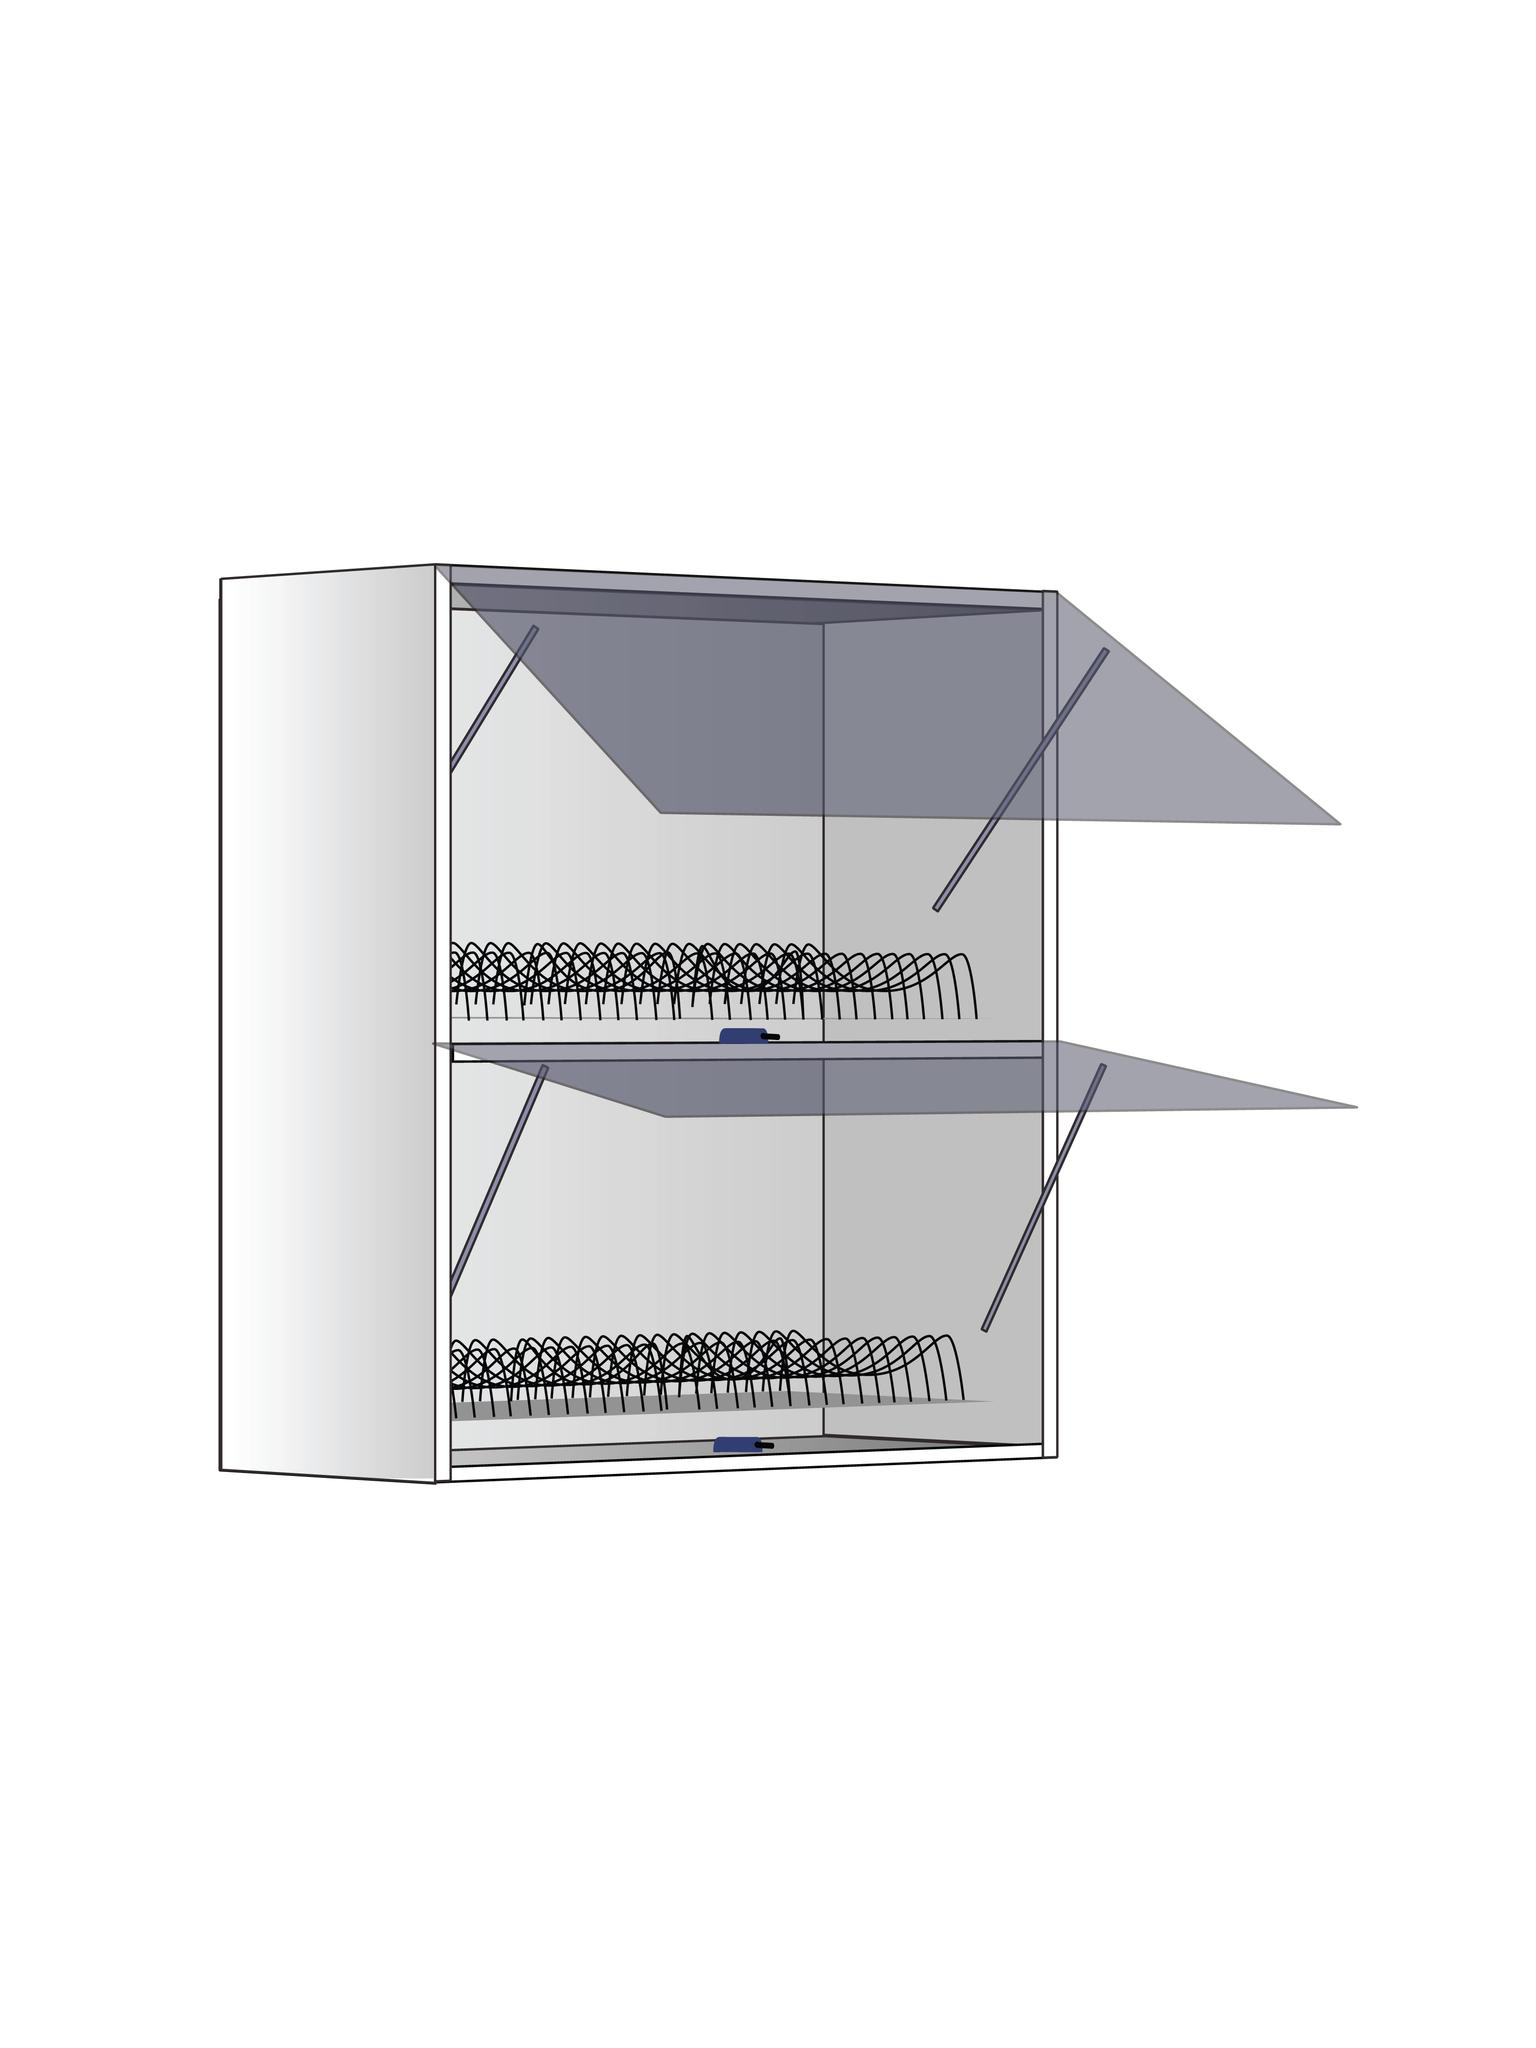 Верхний шкаф с сушилкой и газлифтами, 720Х600 мм / PushToOpen